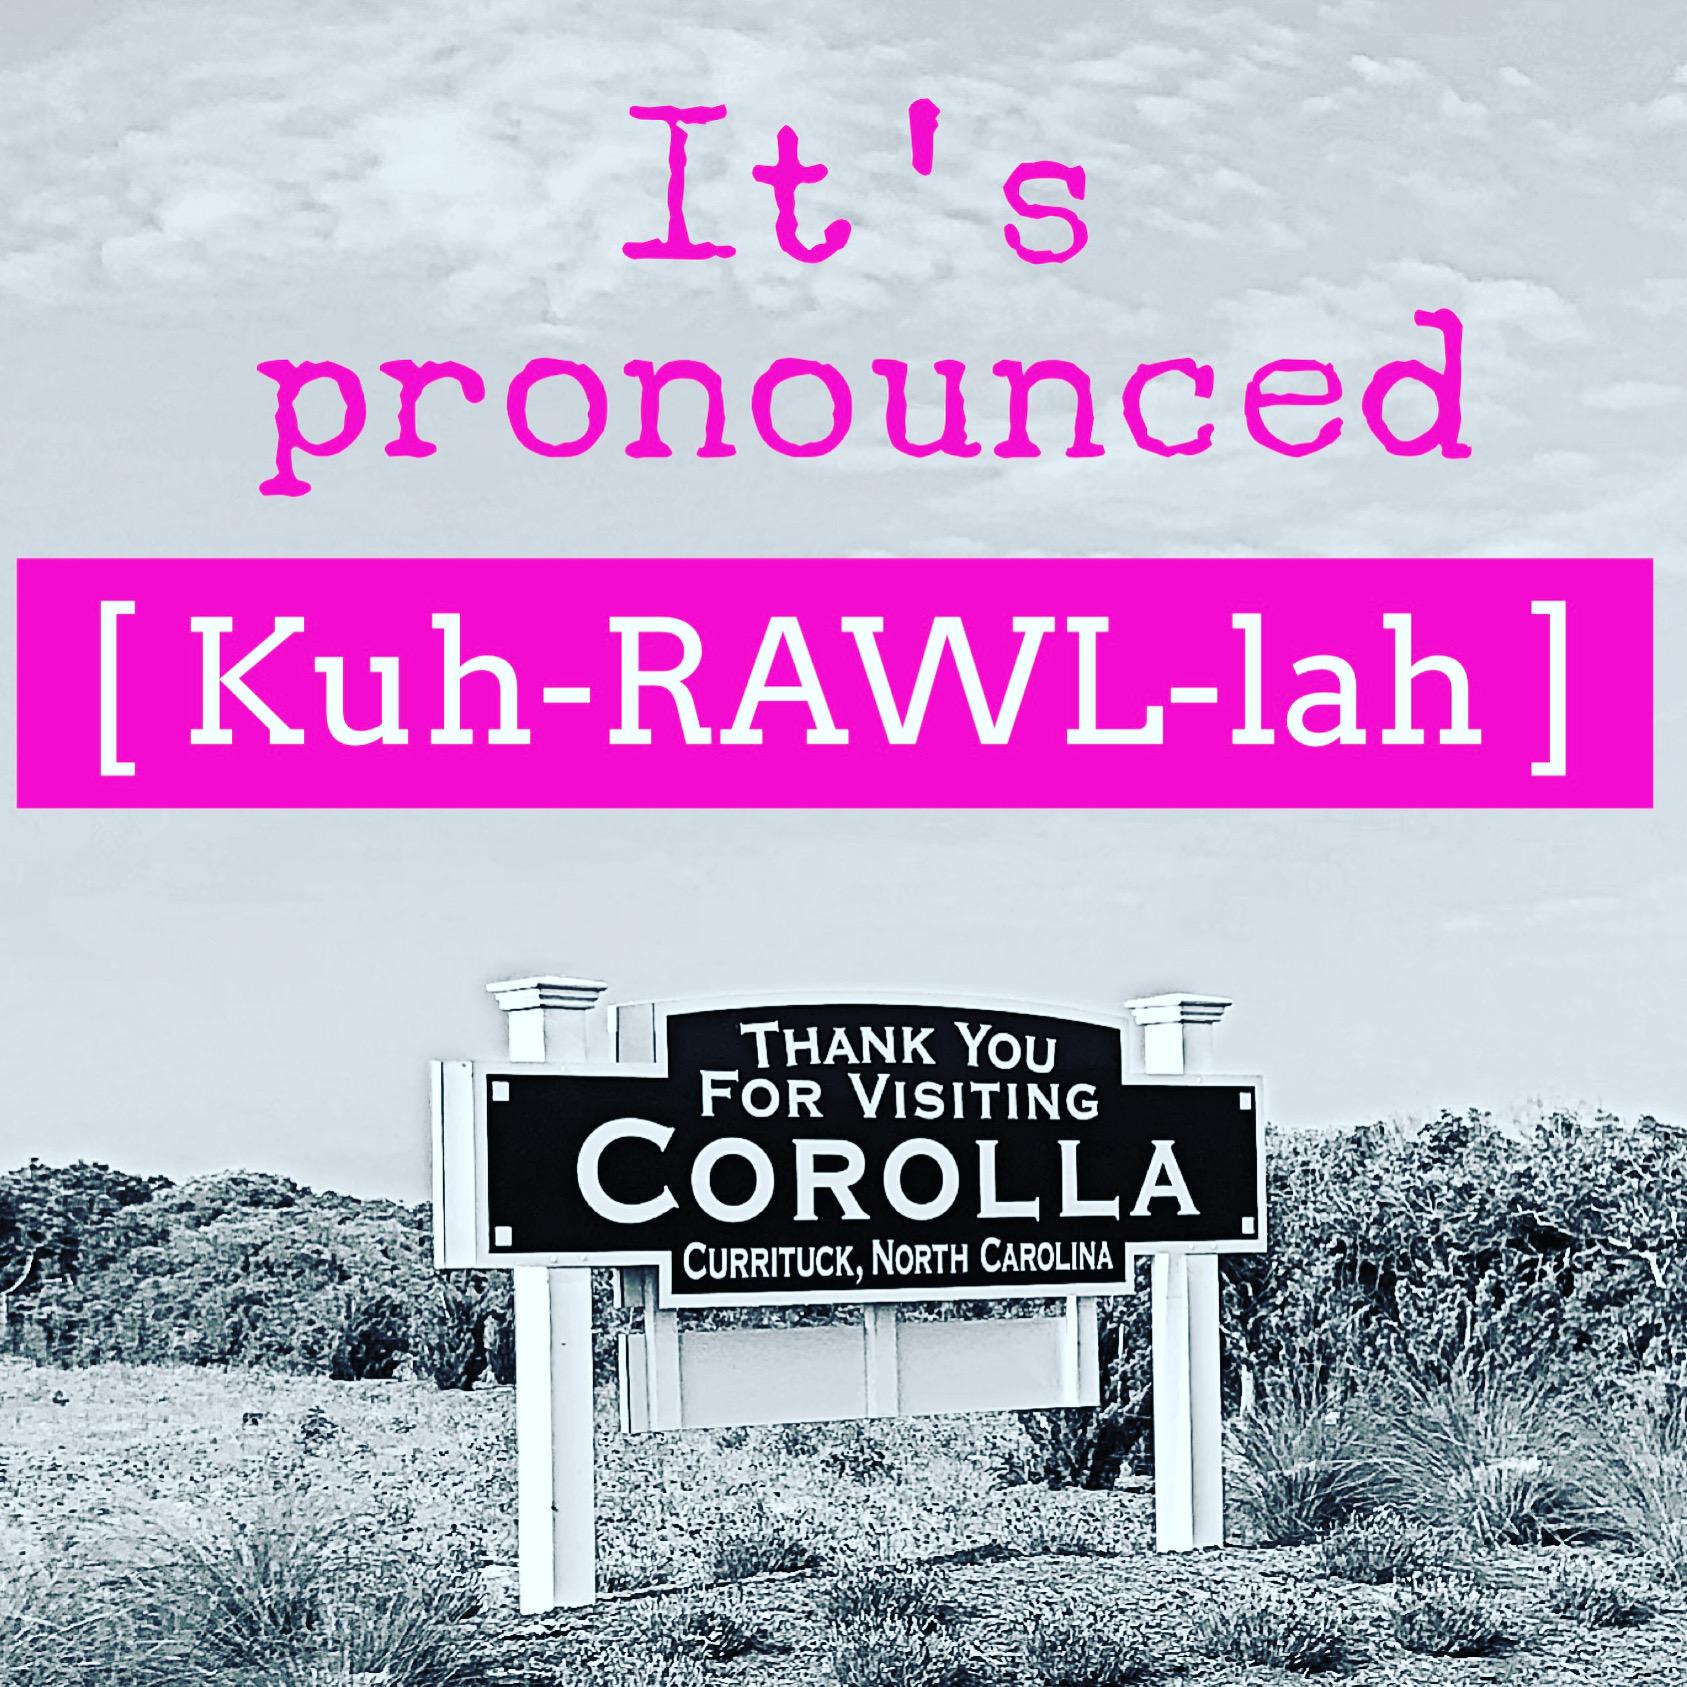 Kuh-RAWL-lah